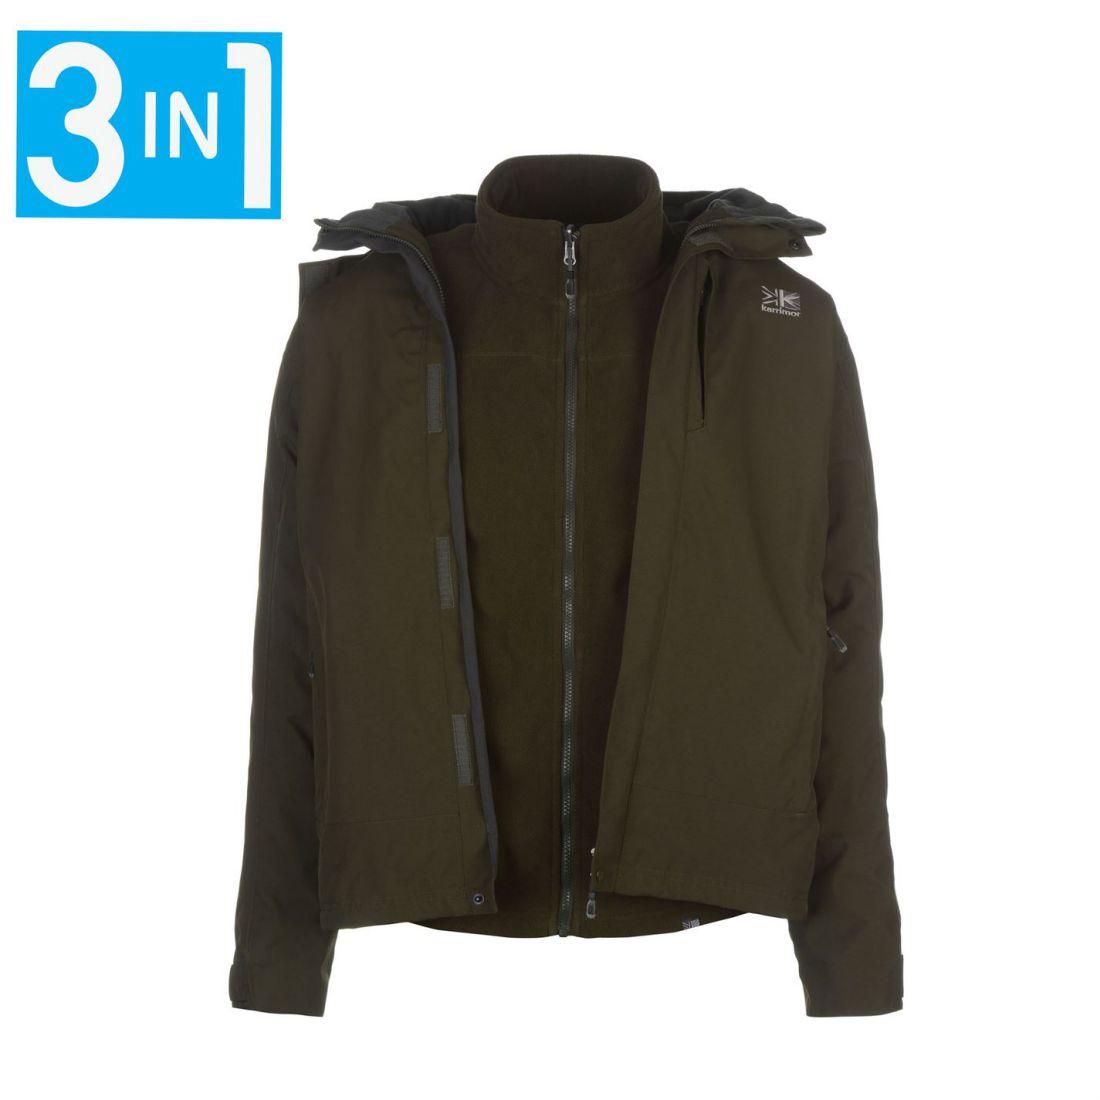 313d170c9881 Karrimor Mens 3in1 Jacket Mesh Lining Concealable Hood Water ...